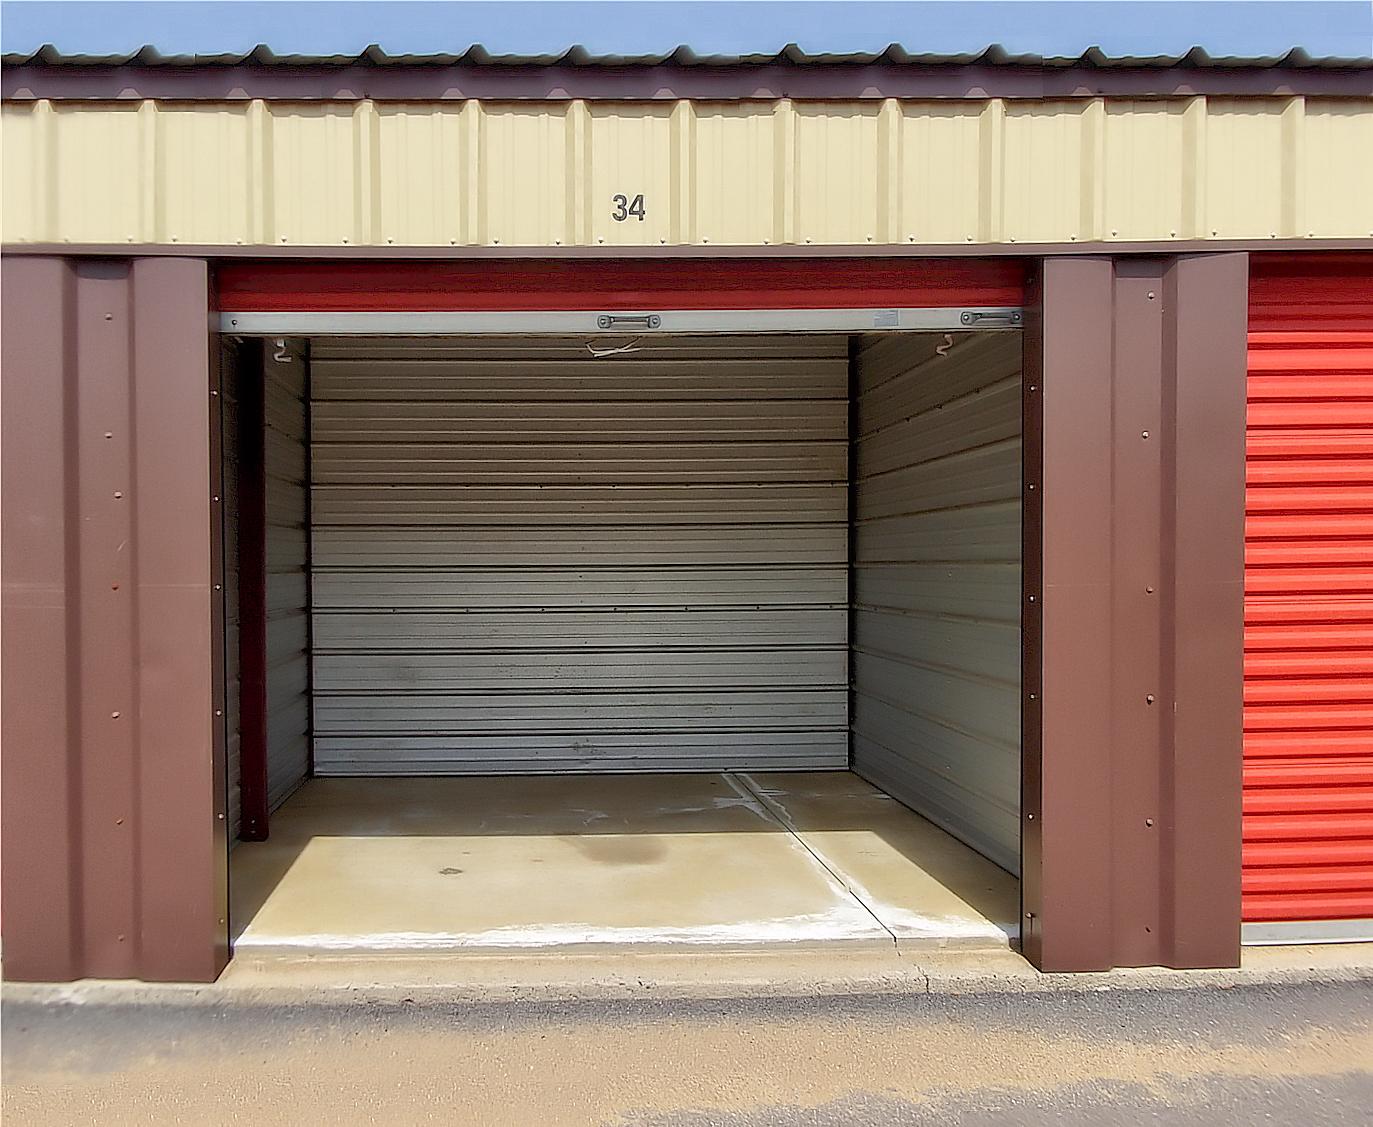 Eliot Rent-A-Space & Self Storage